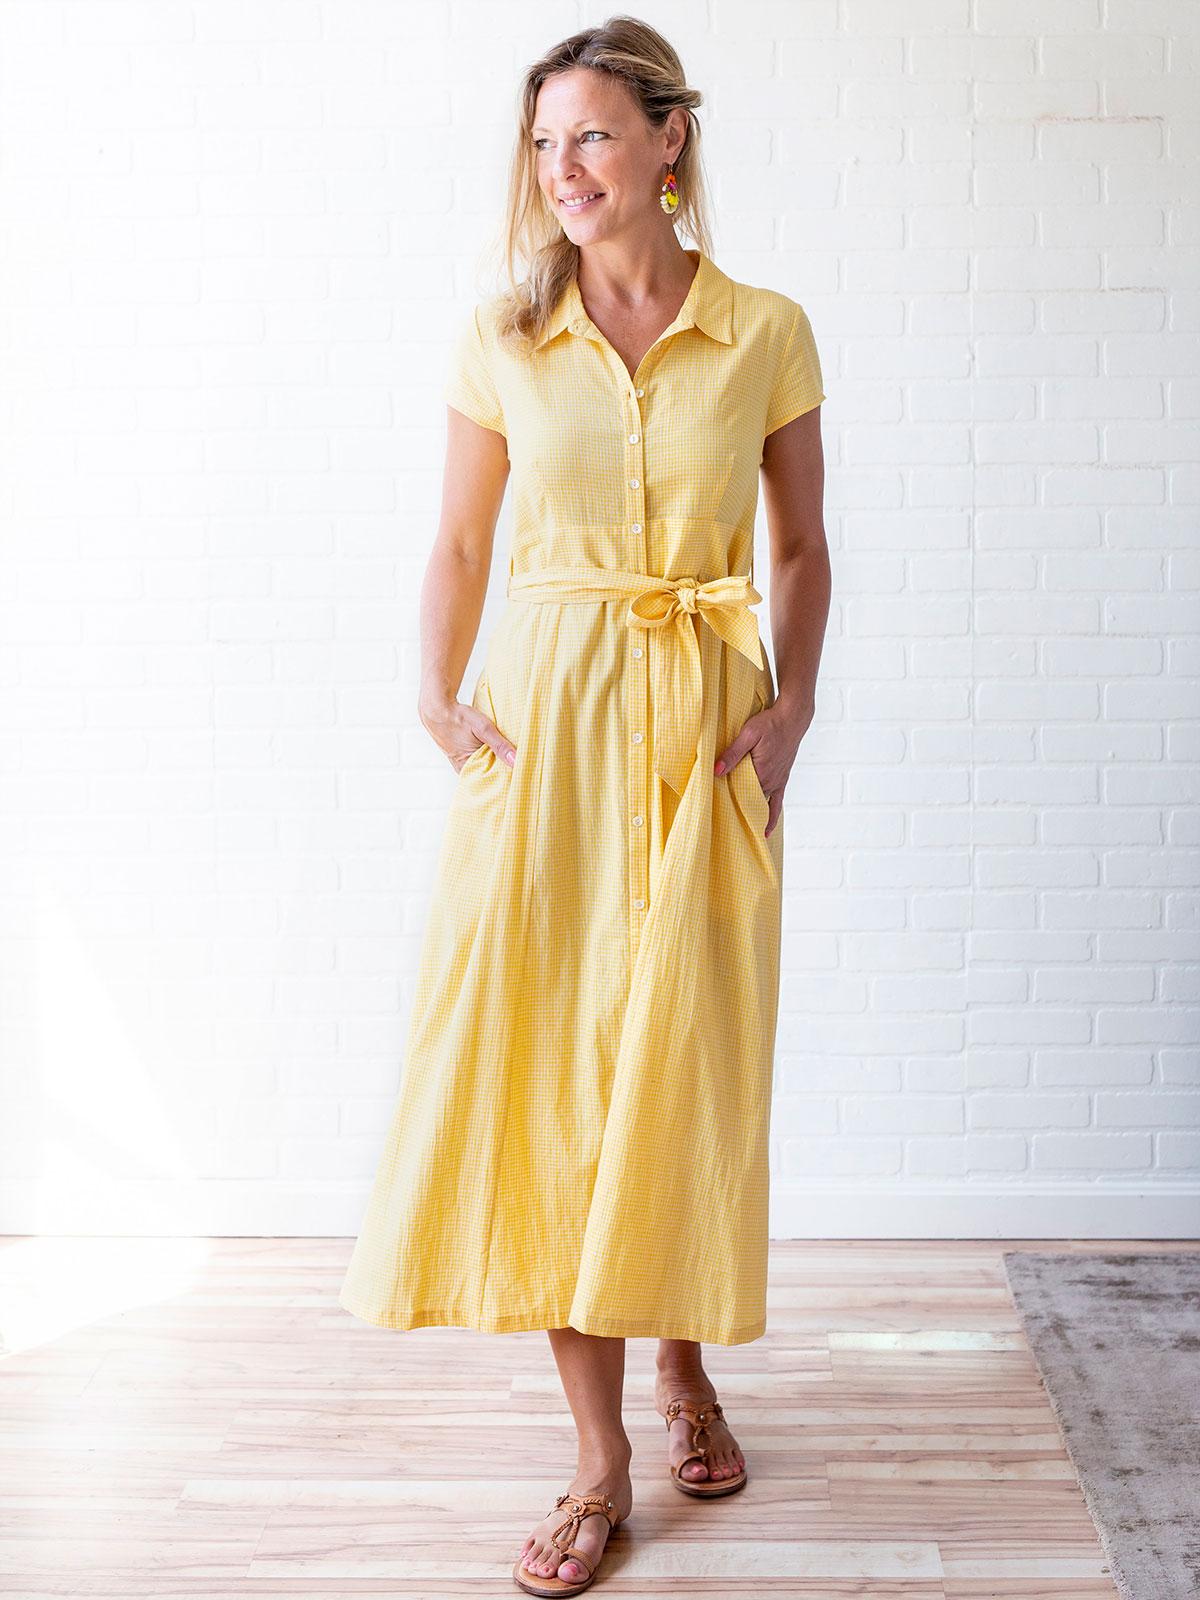 Gingham Check Dress